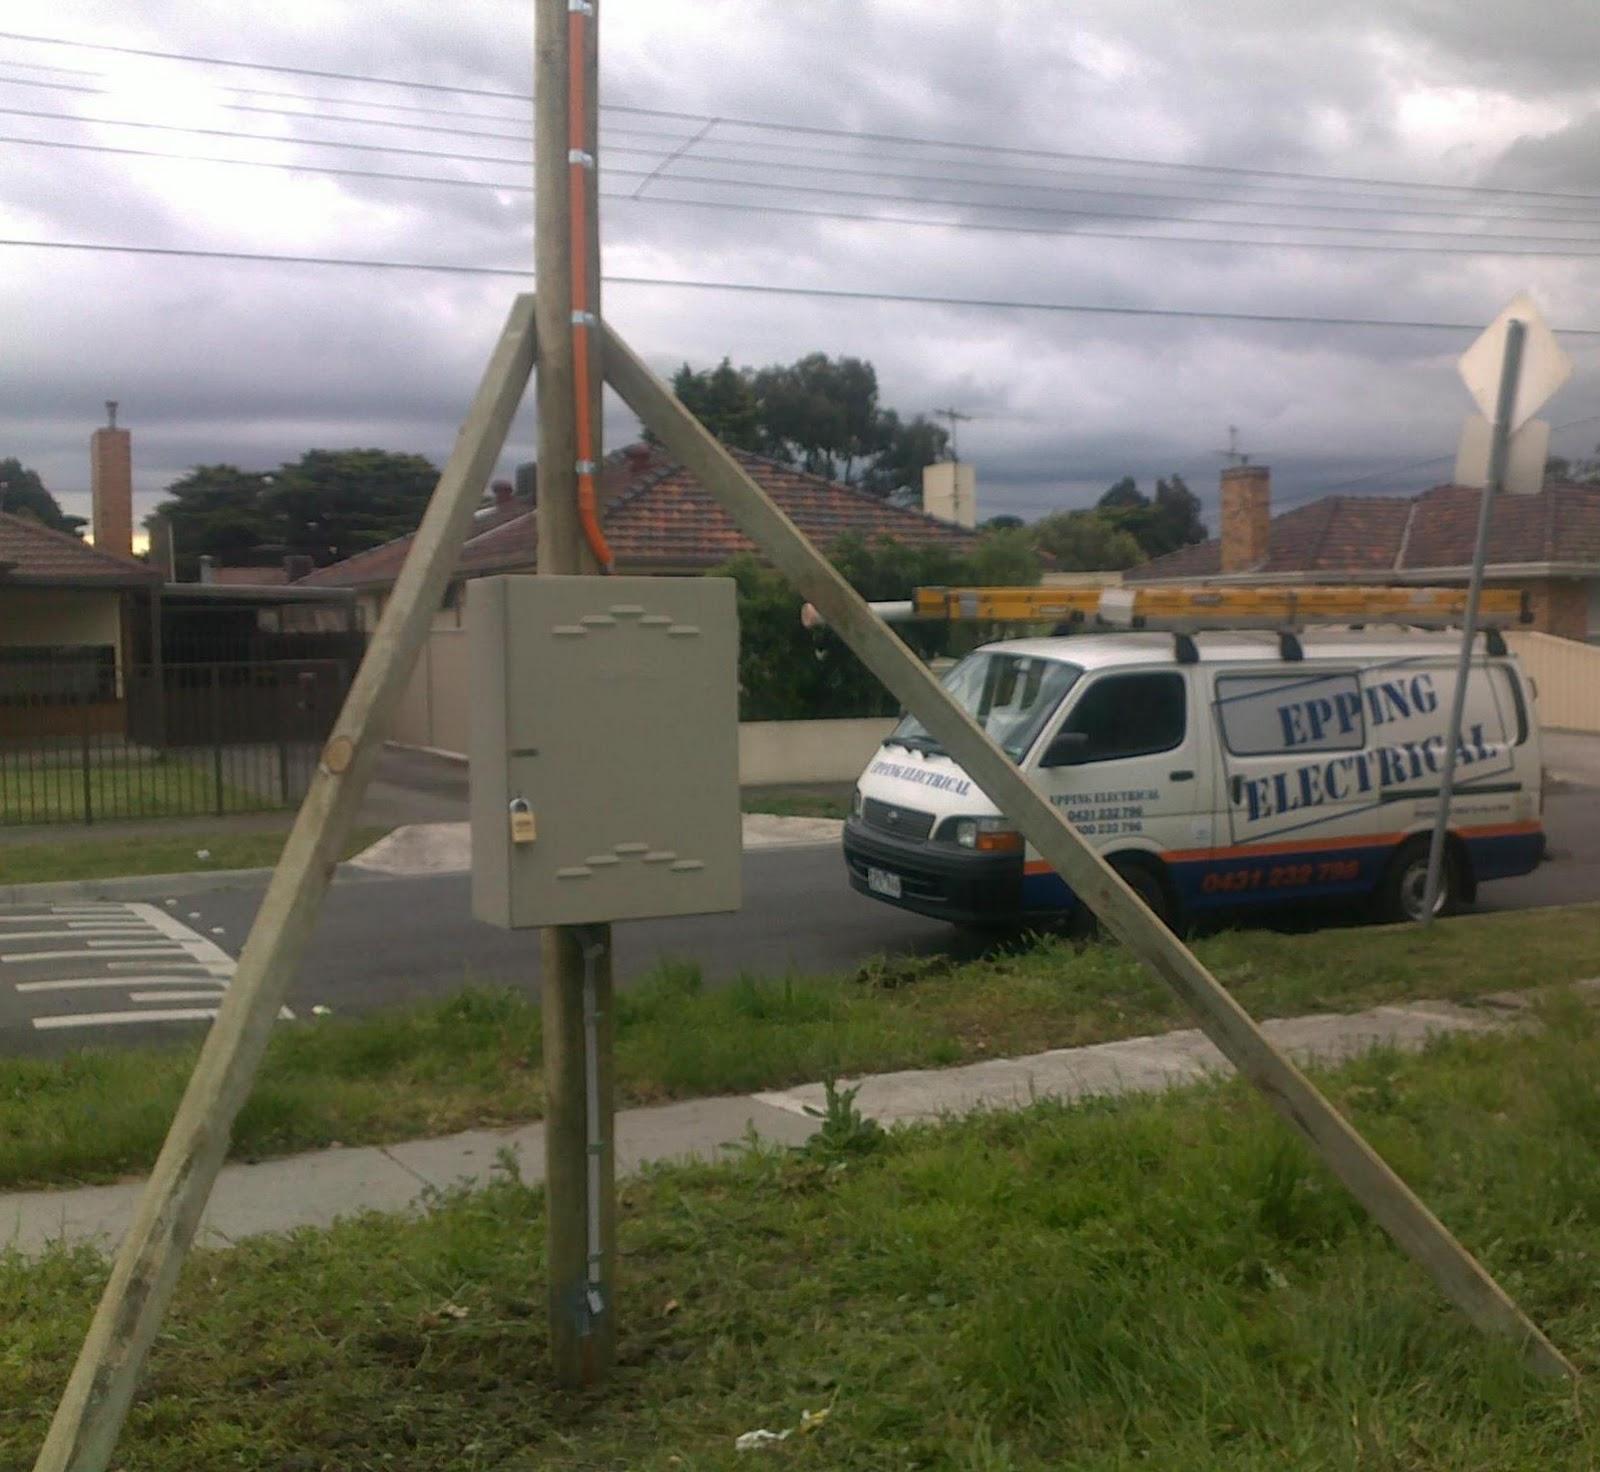 Temporary+electric+meter+box